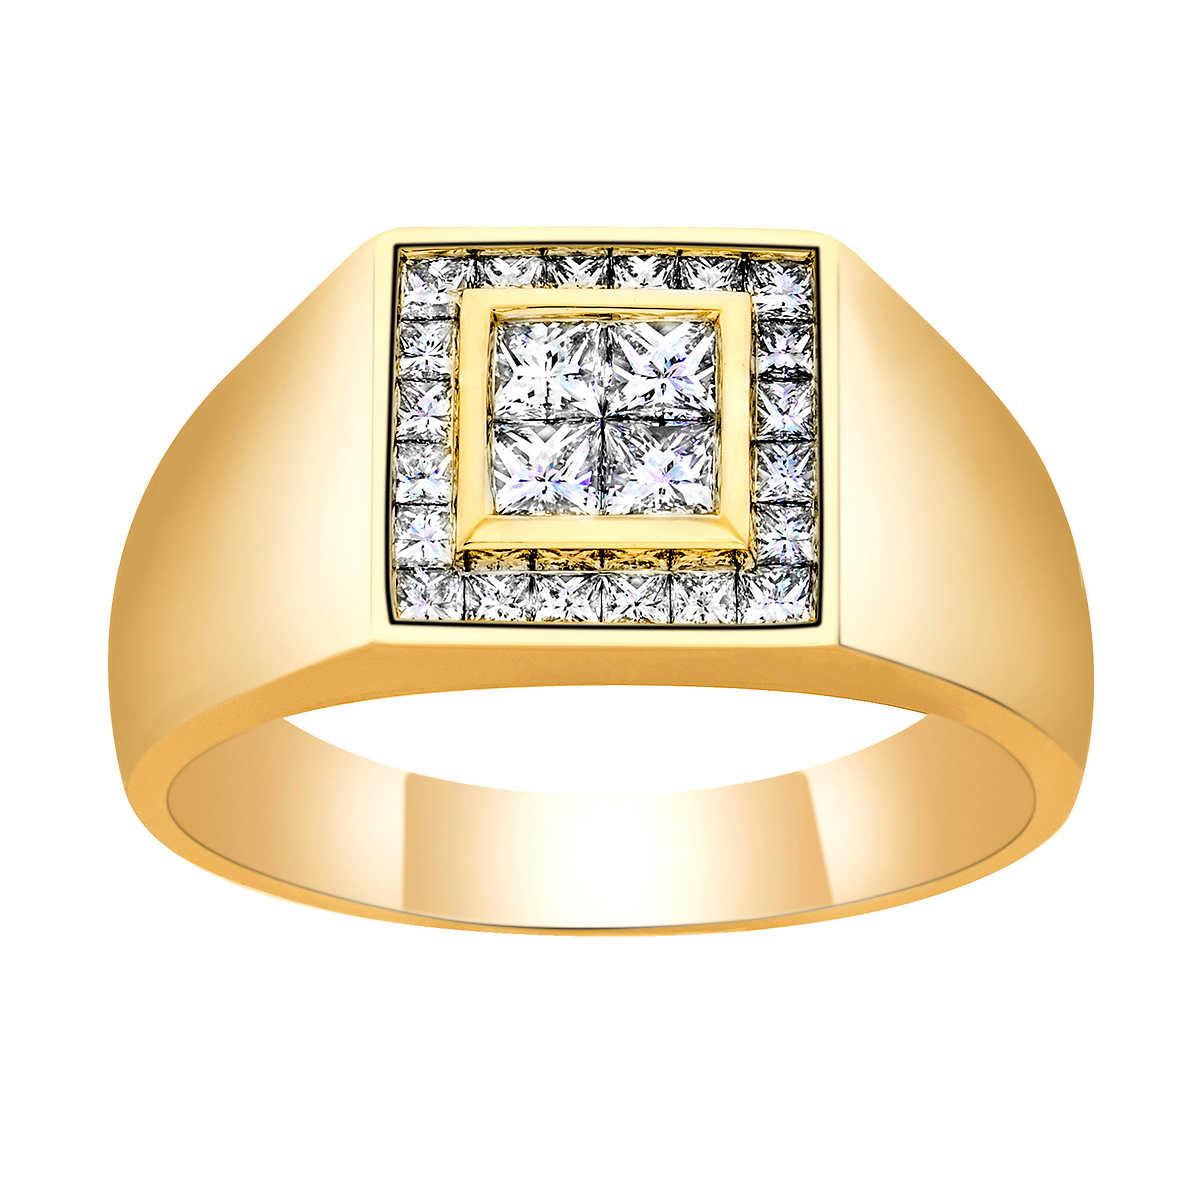 princess cut 095 ctw vs2 clarity i color diamond 14kt yellow gold mens ring